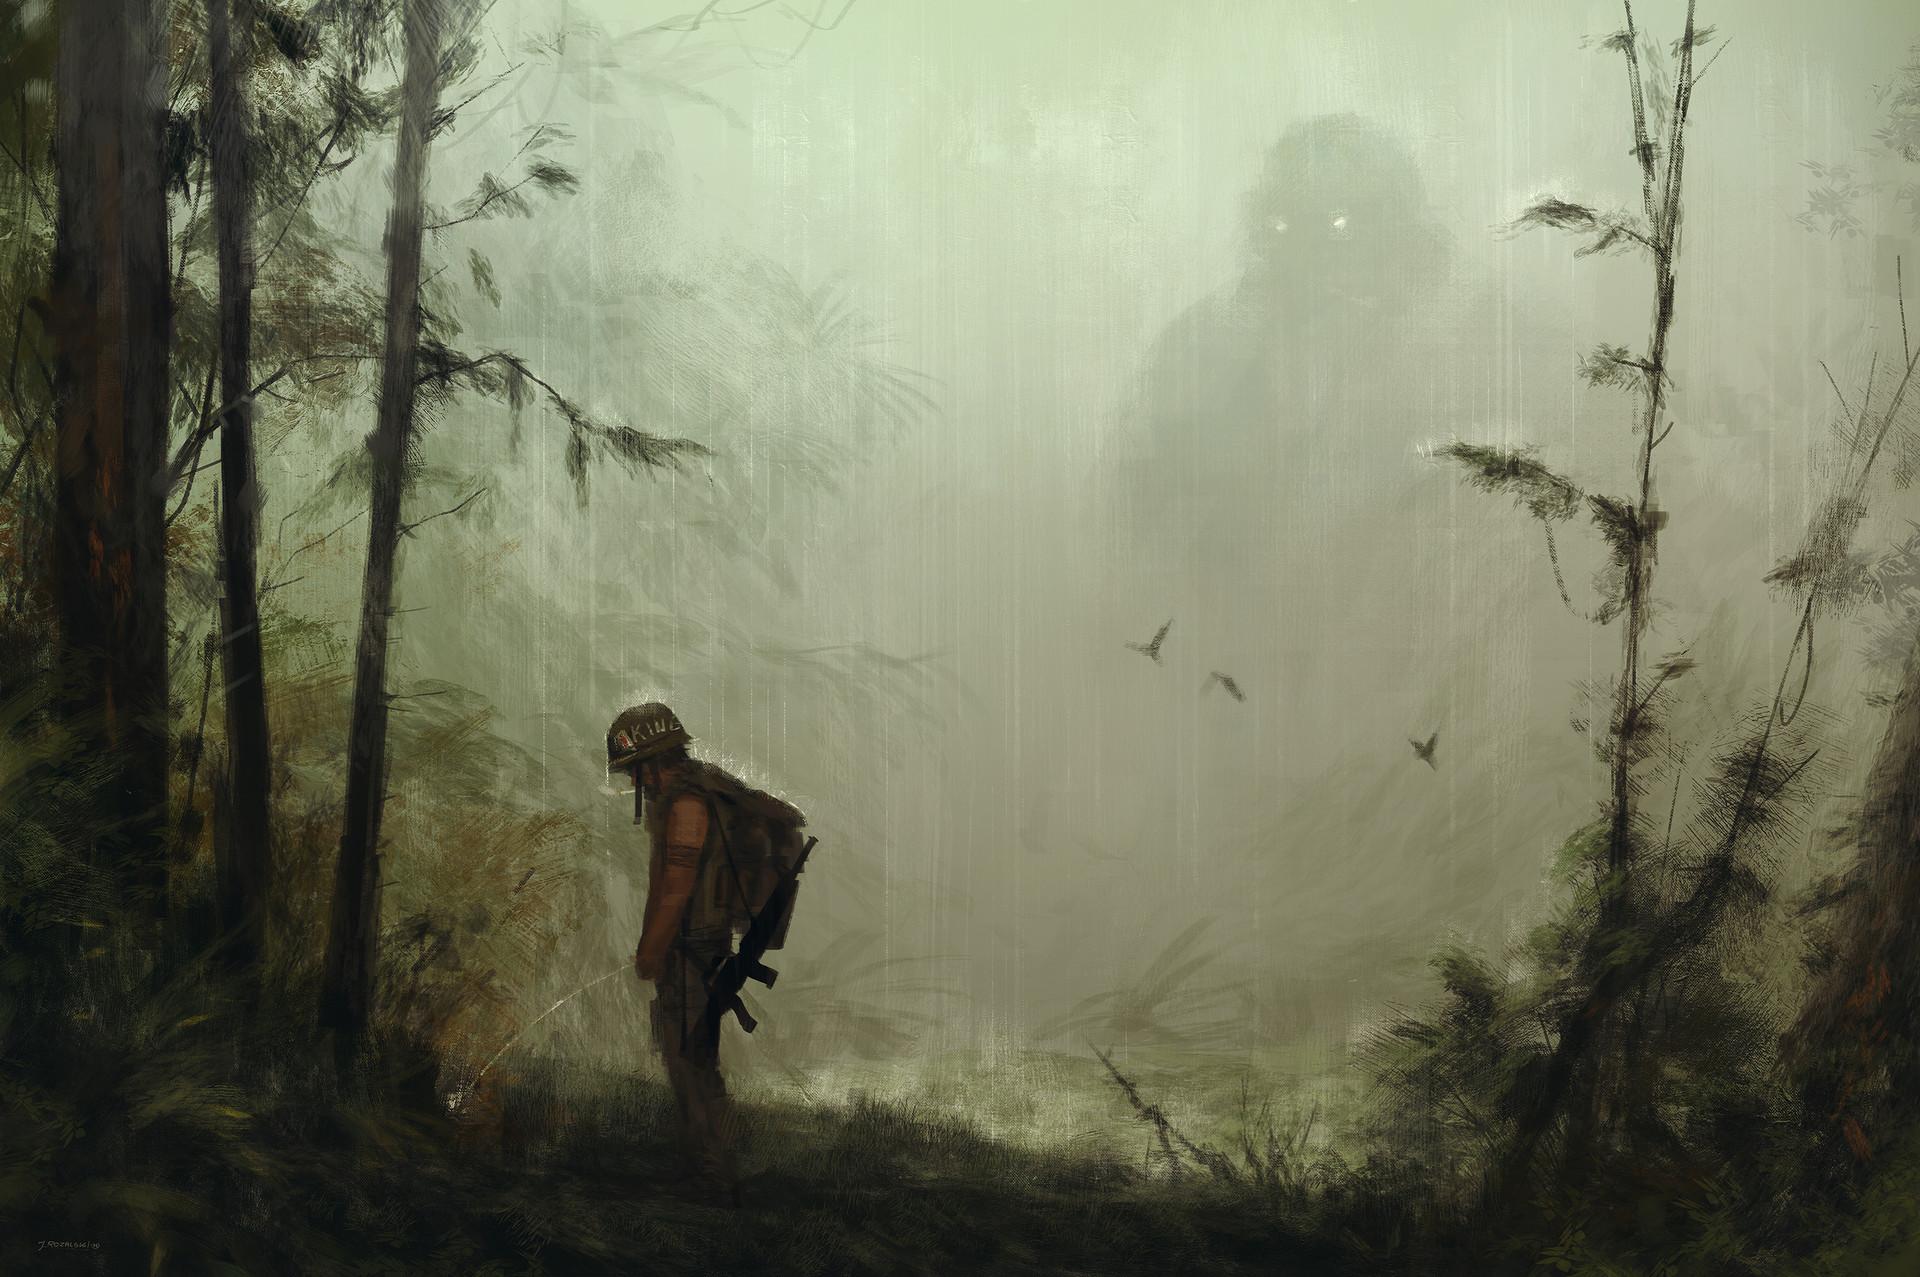 Jakub rozalski kong rain jrs